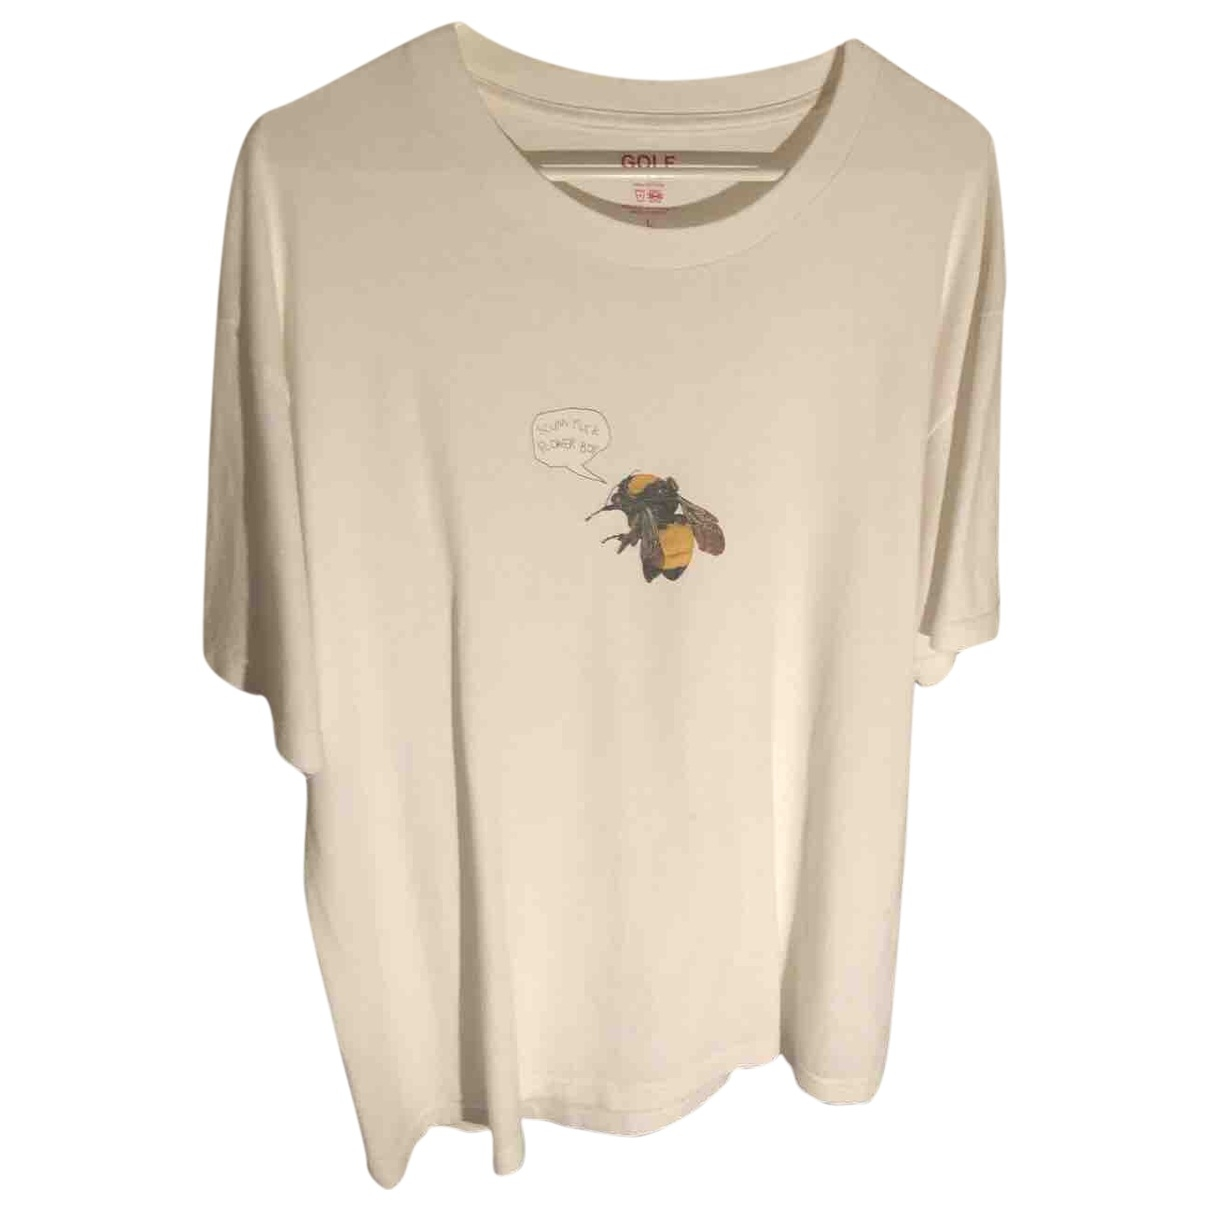 Golf Wang - Tee shirts   pour homme en coton - blanc